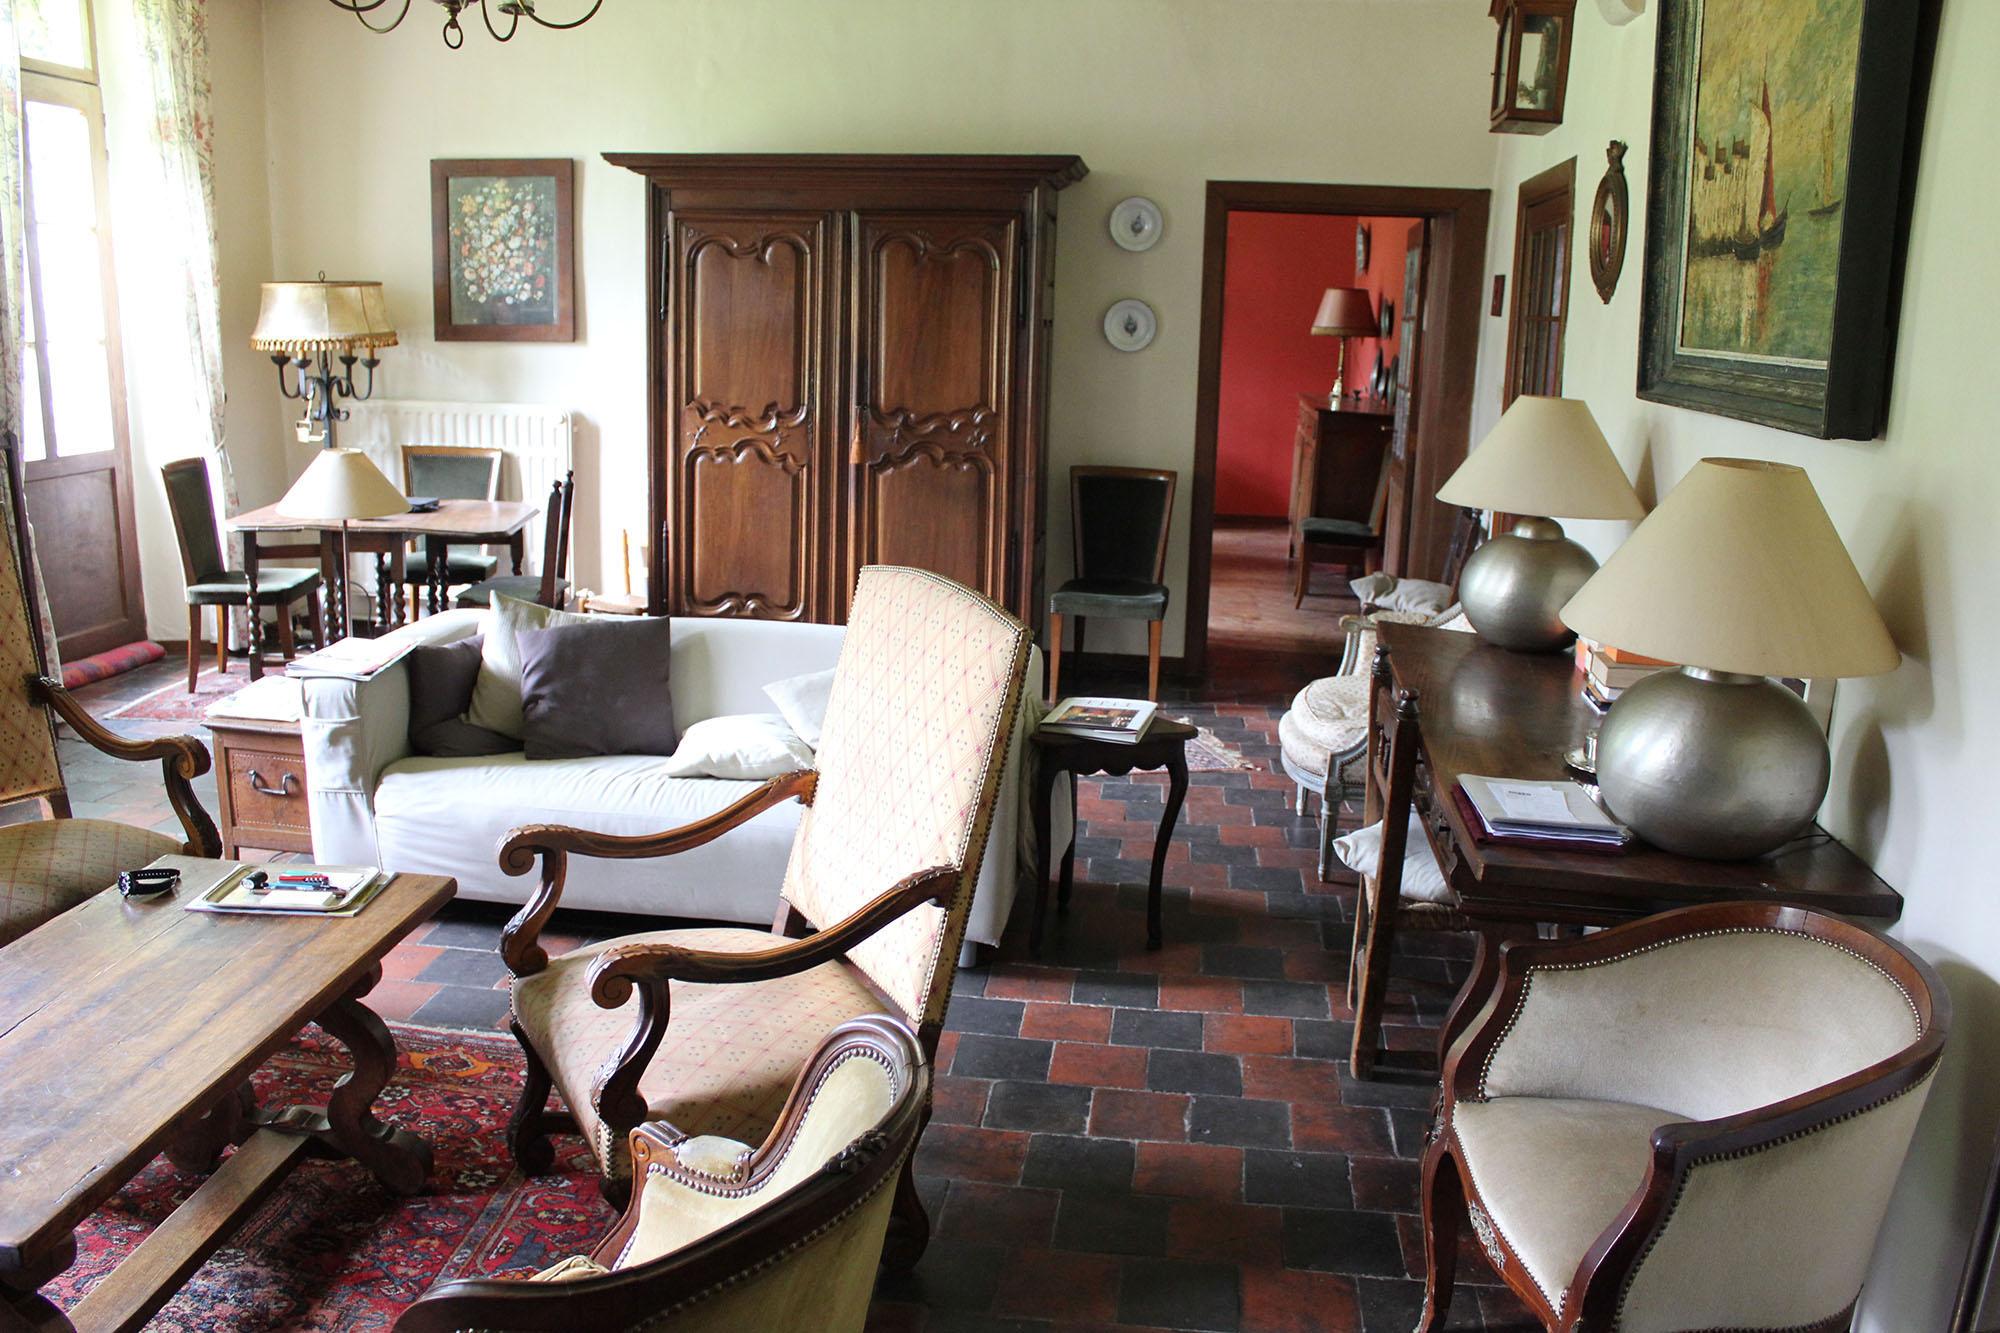 ferme vendre brabant wallon. Black Bedroom Furniture Sets. Home Design Ideas